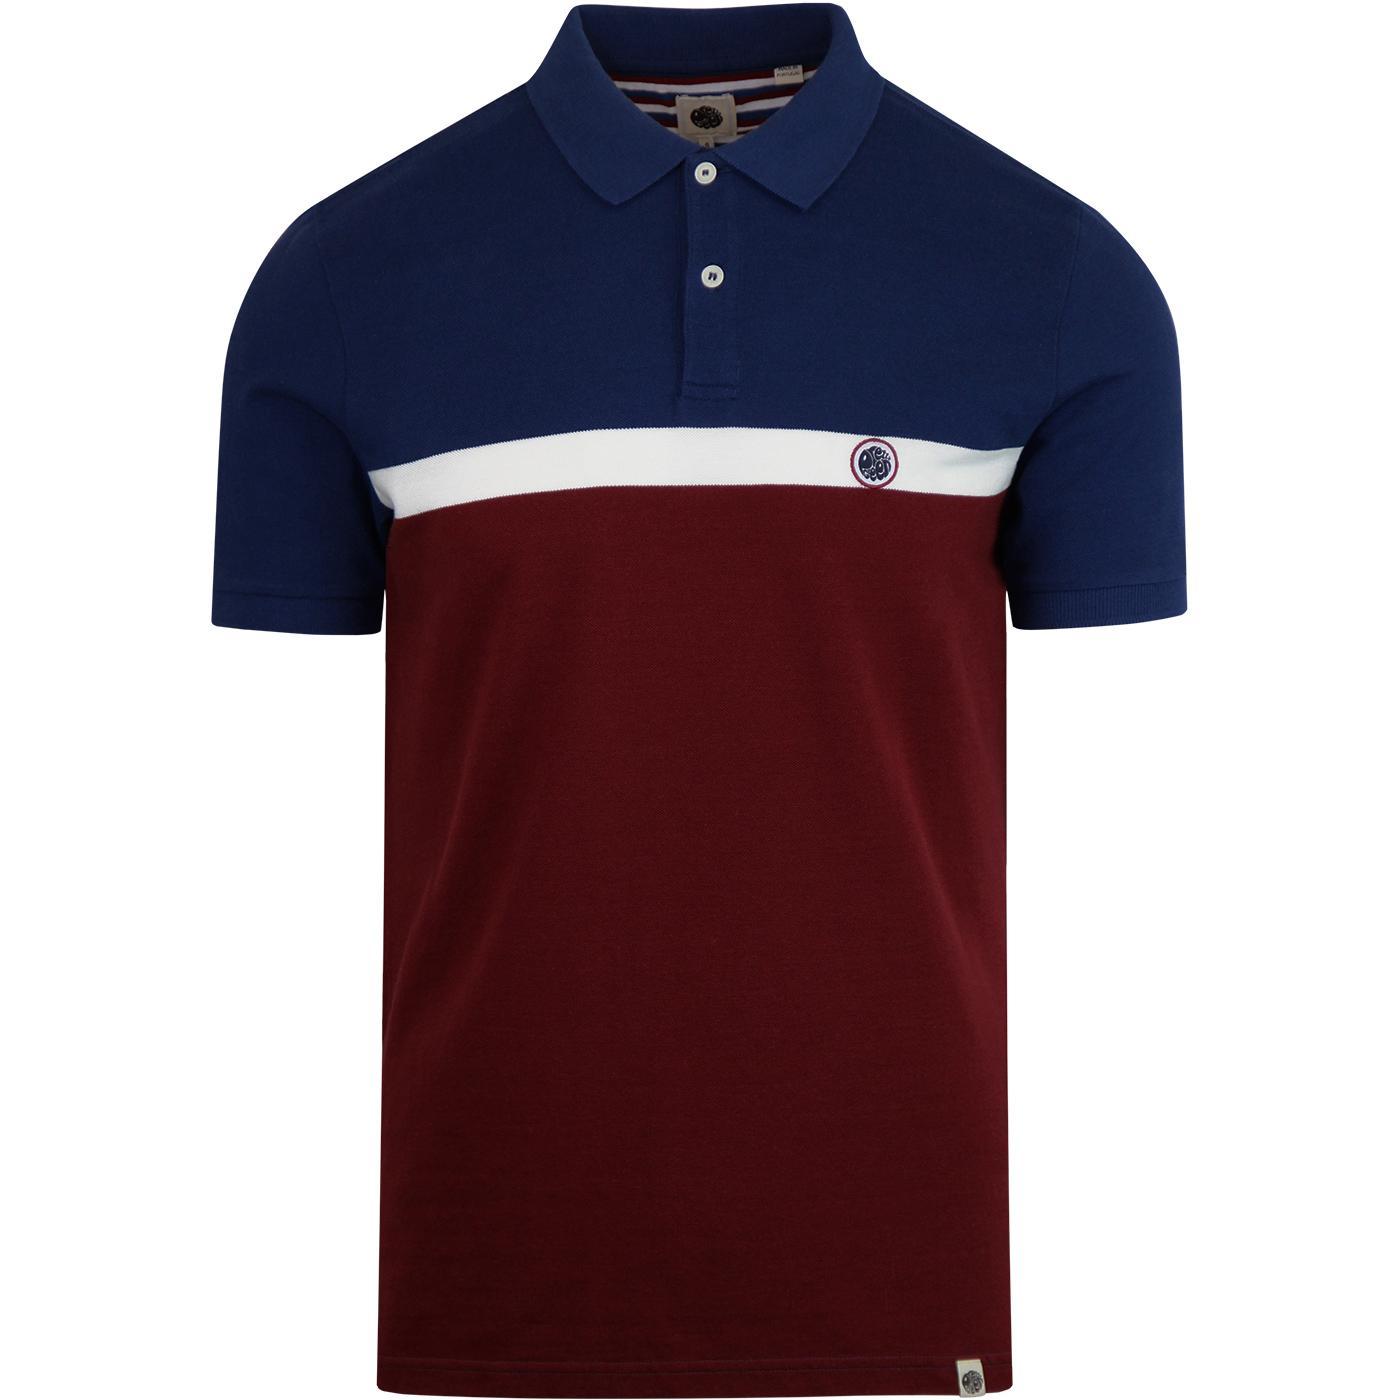 PRETTY GREEN Mod Colour Block Polo Shirt BURGUNDY